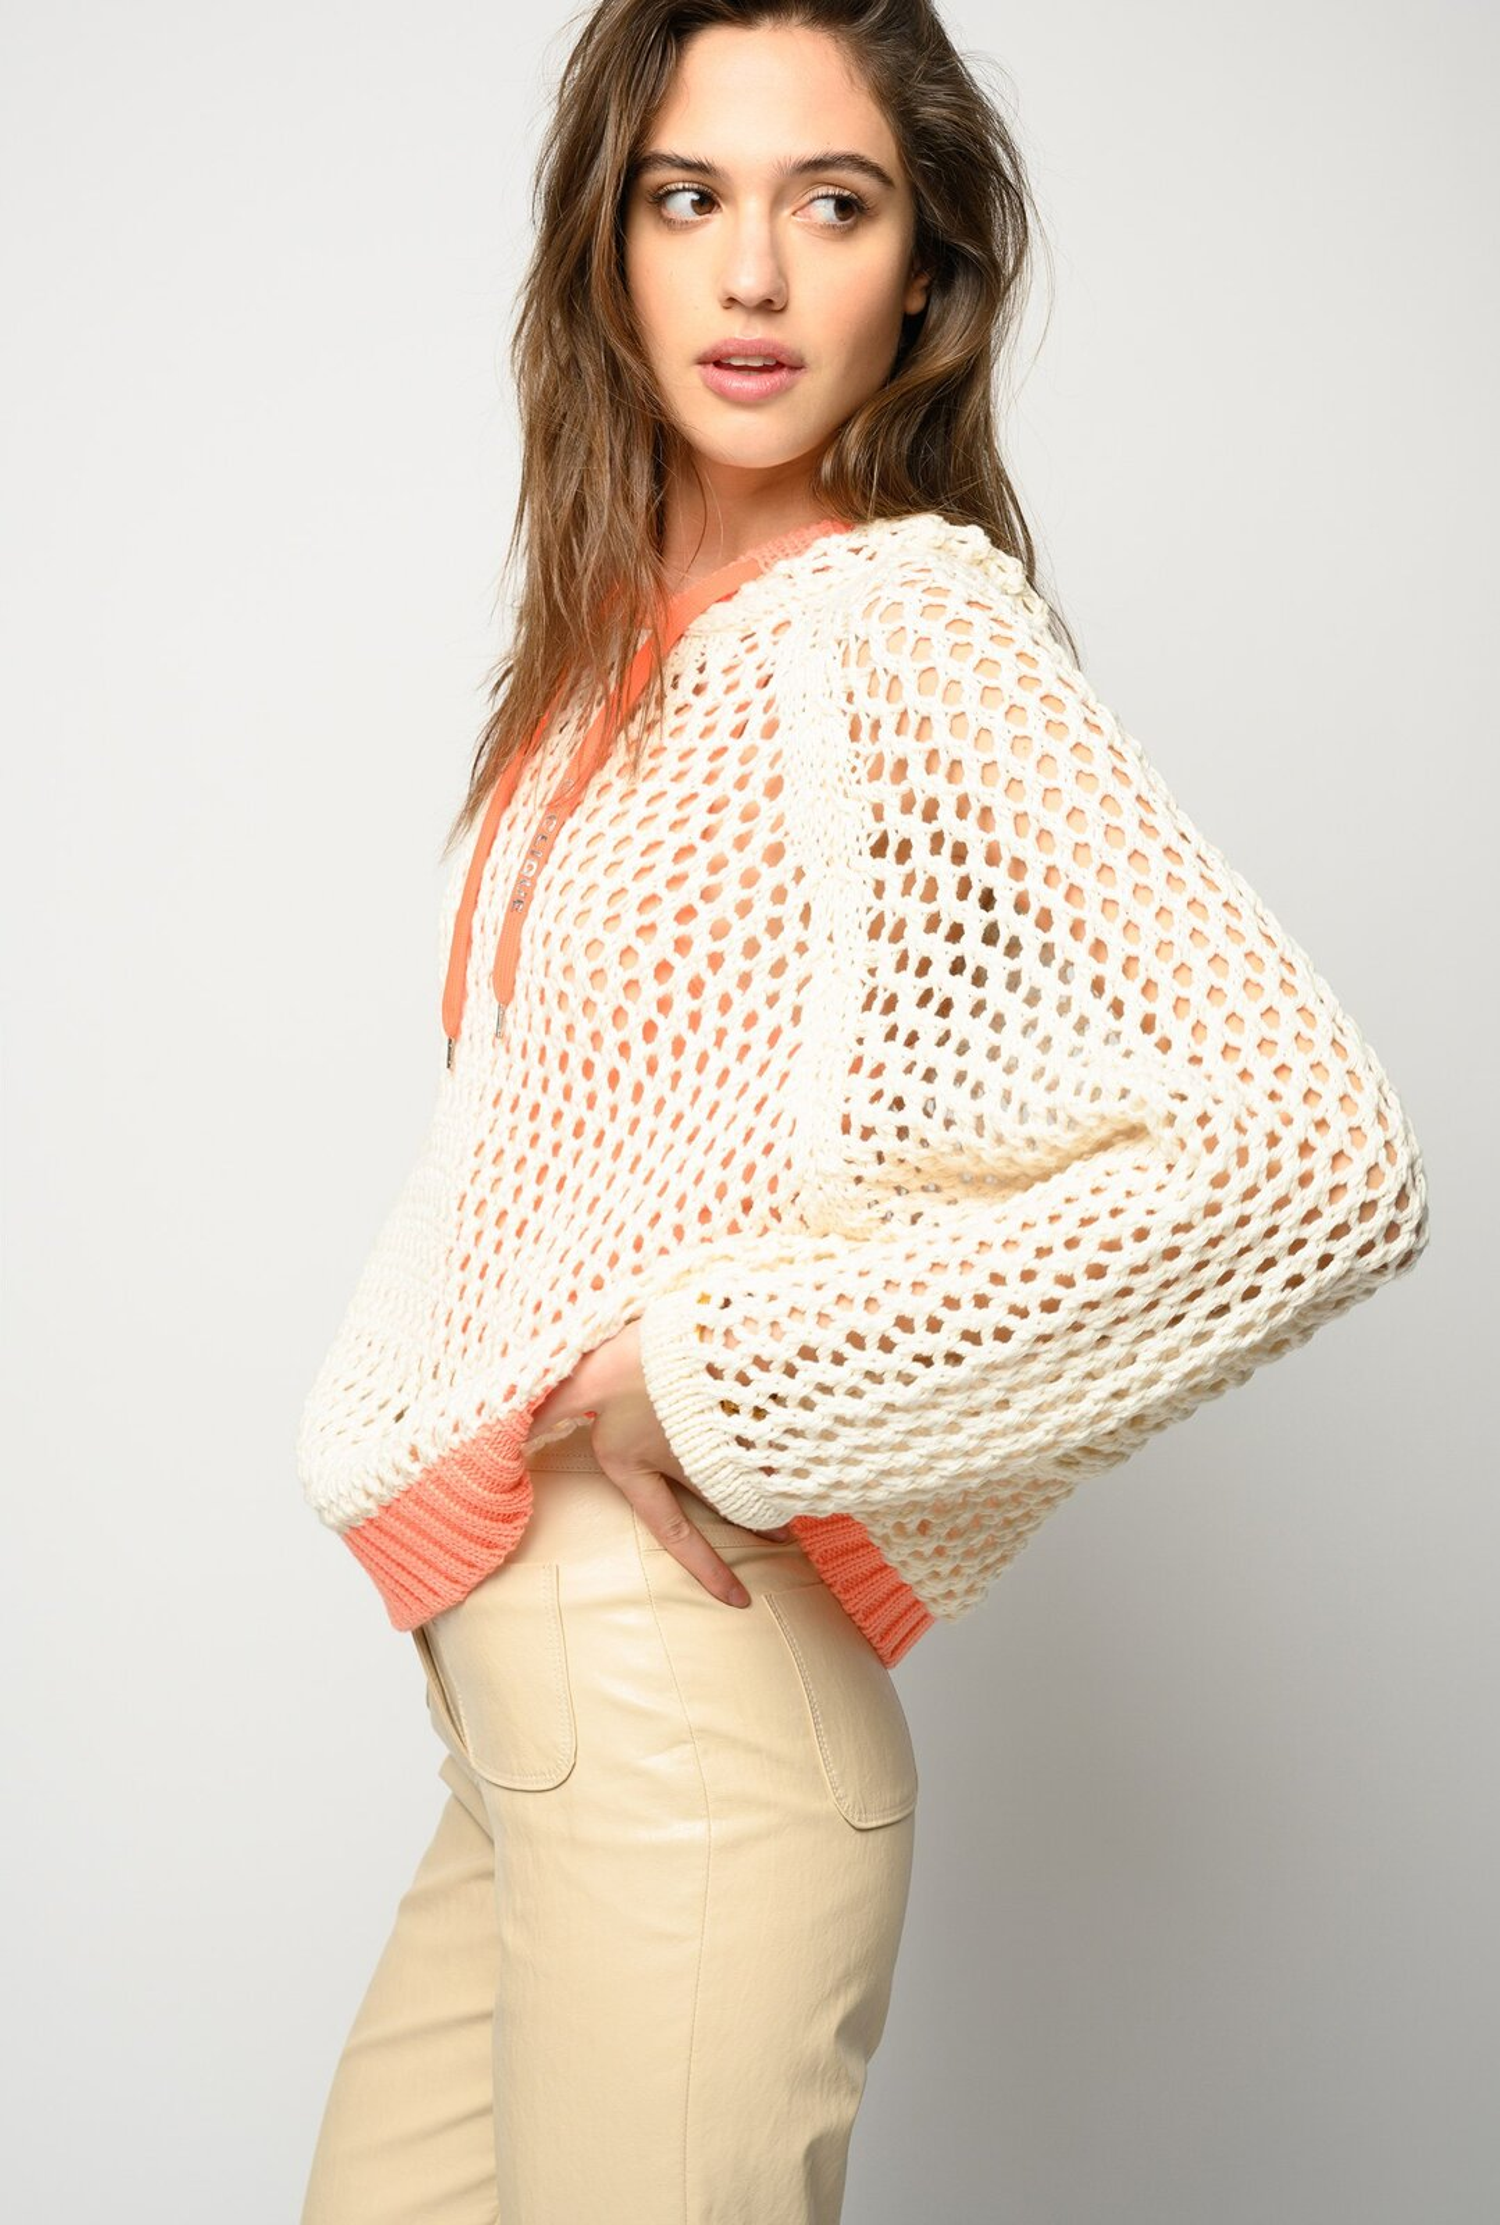 Crochet Net Effect Pullover - Pinko